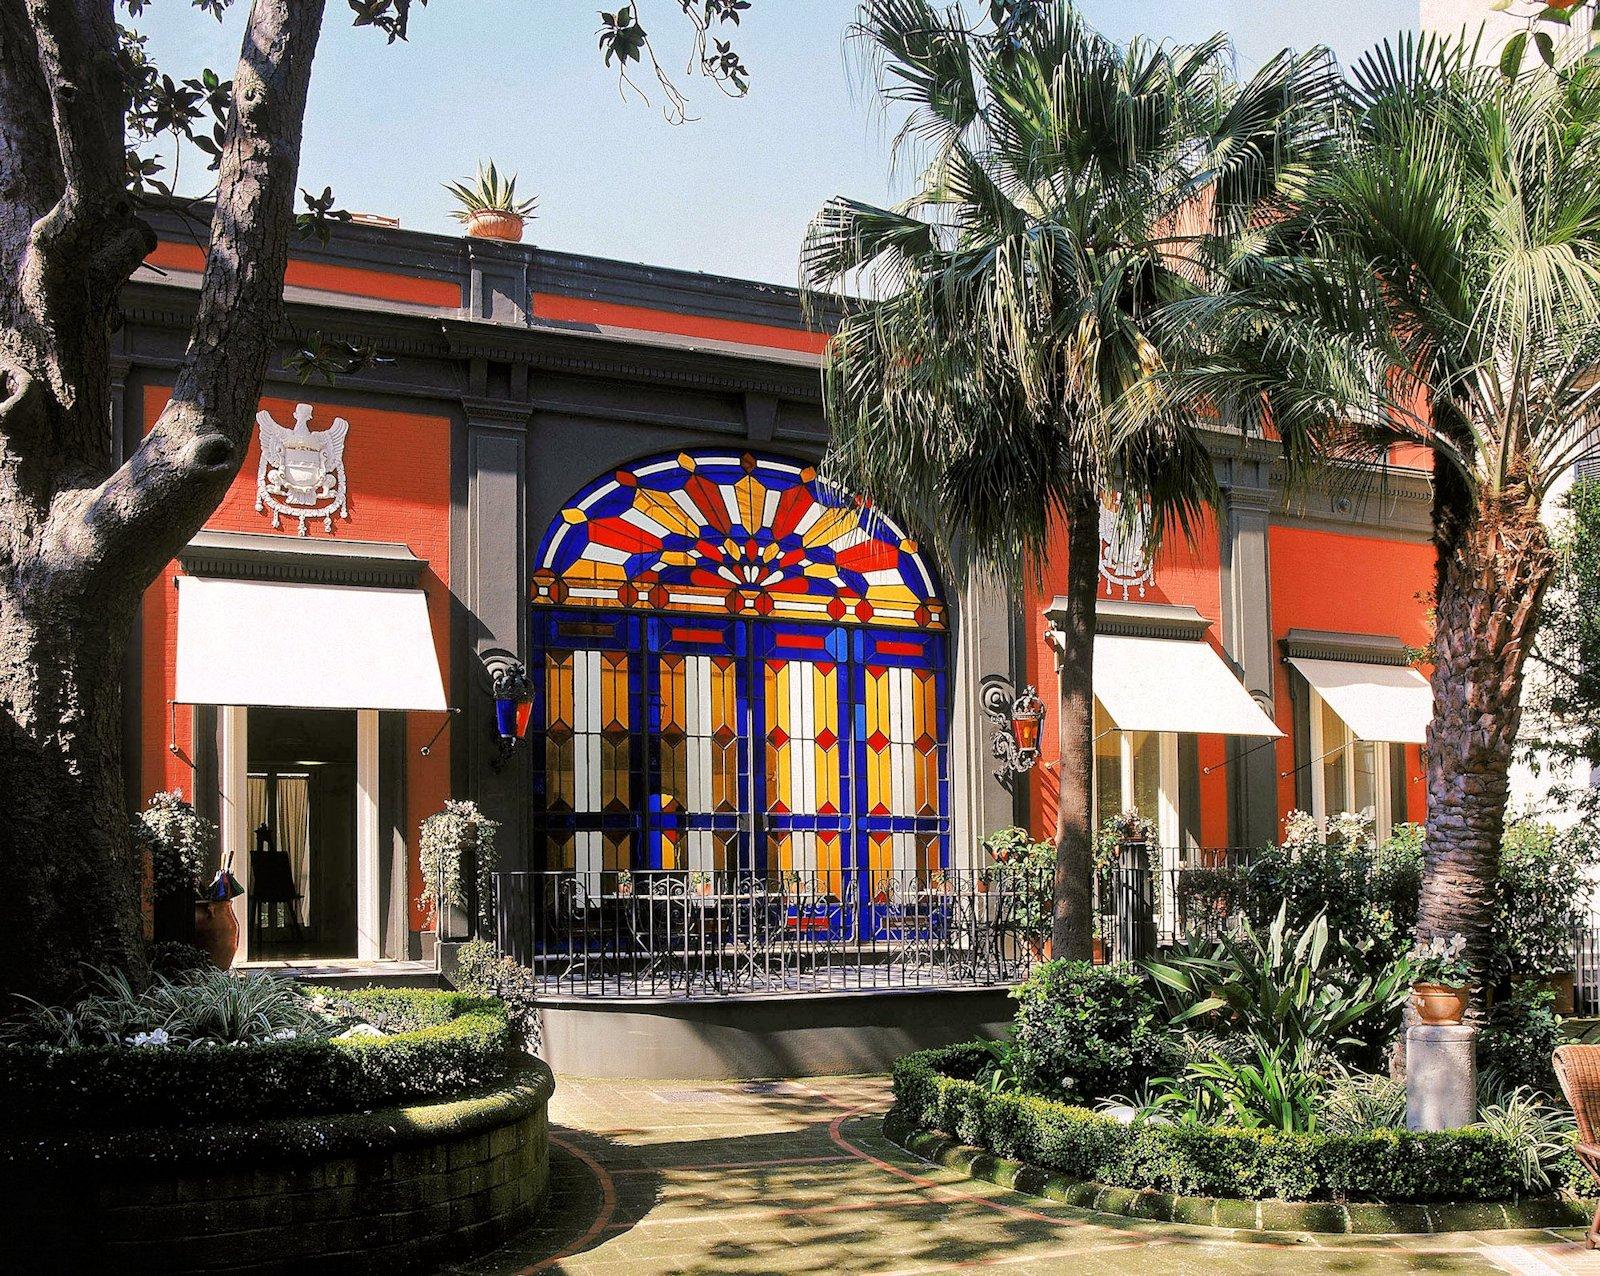 Costantinopoli 104, hotel de charme Naples Italie